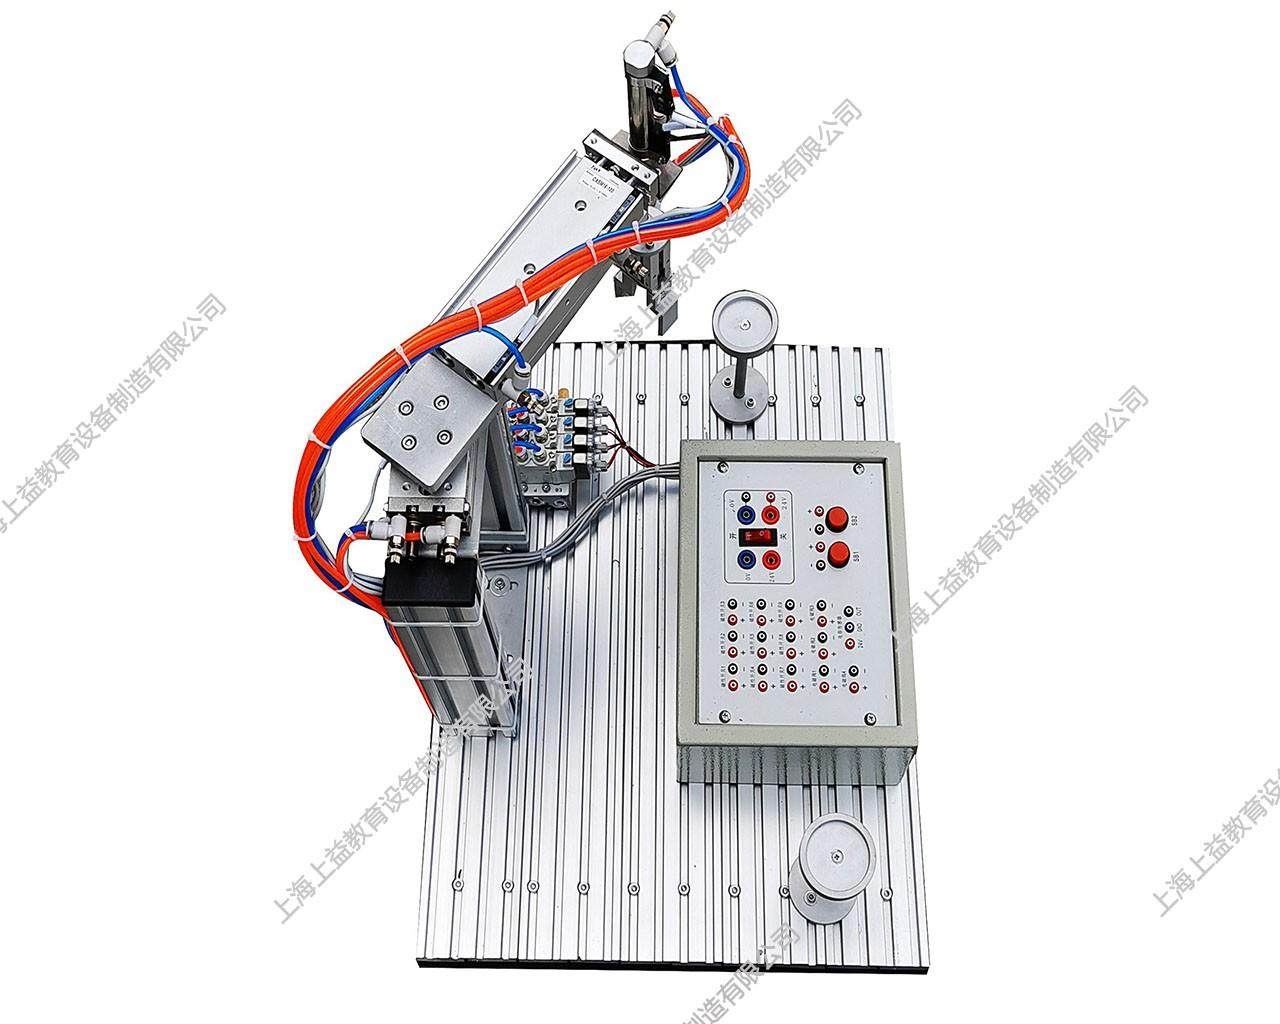 SYSMX-10C 机械手实物教学实验装置